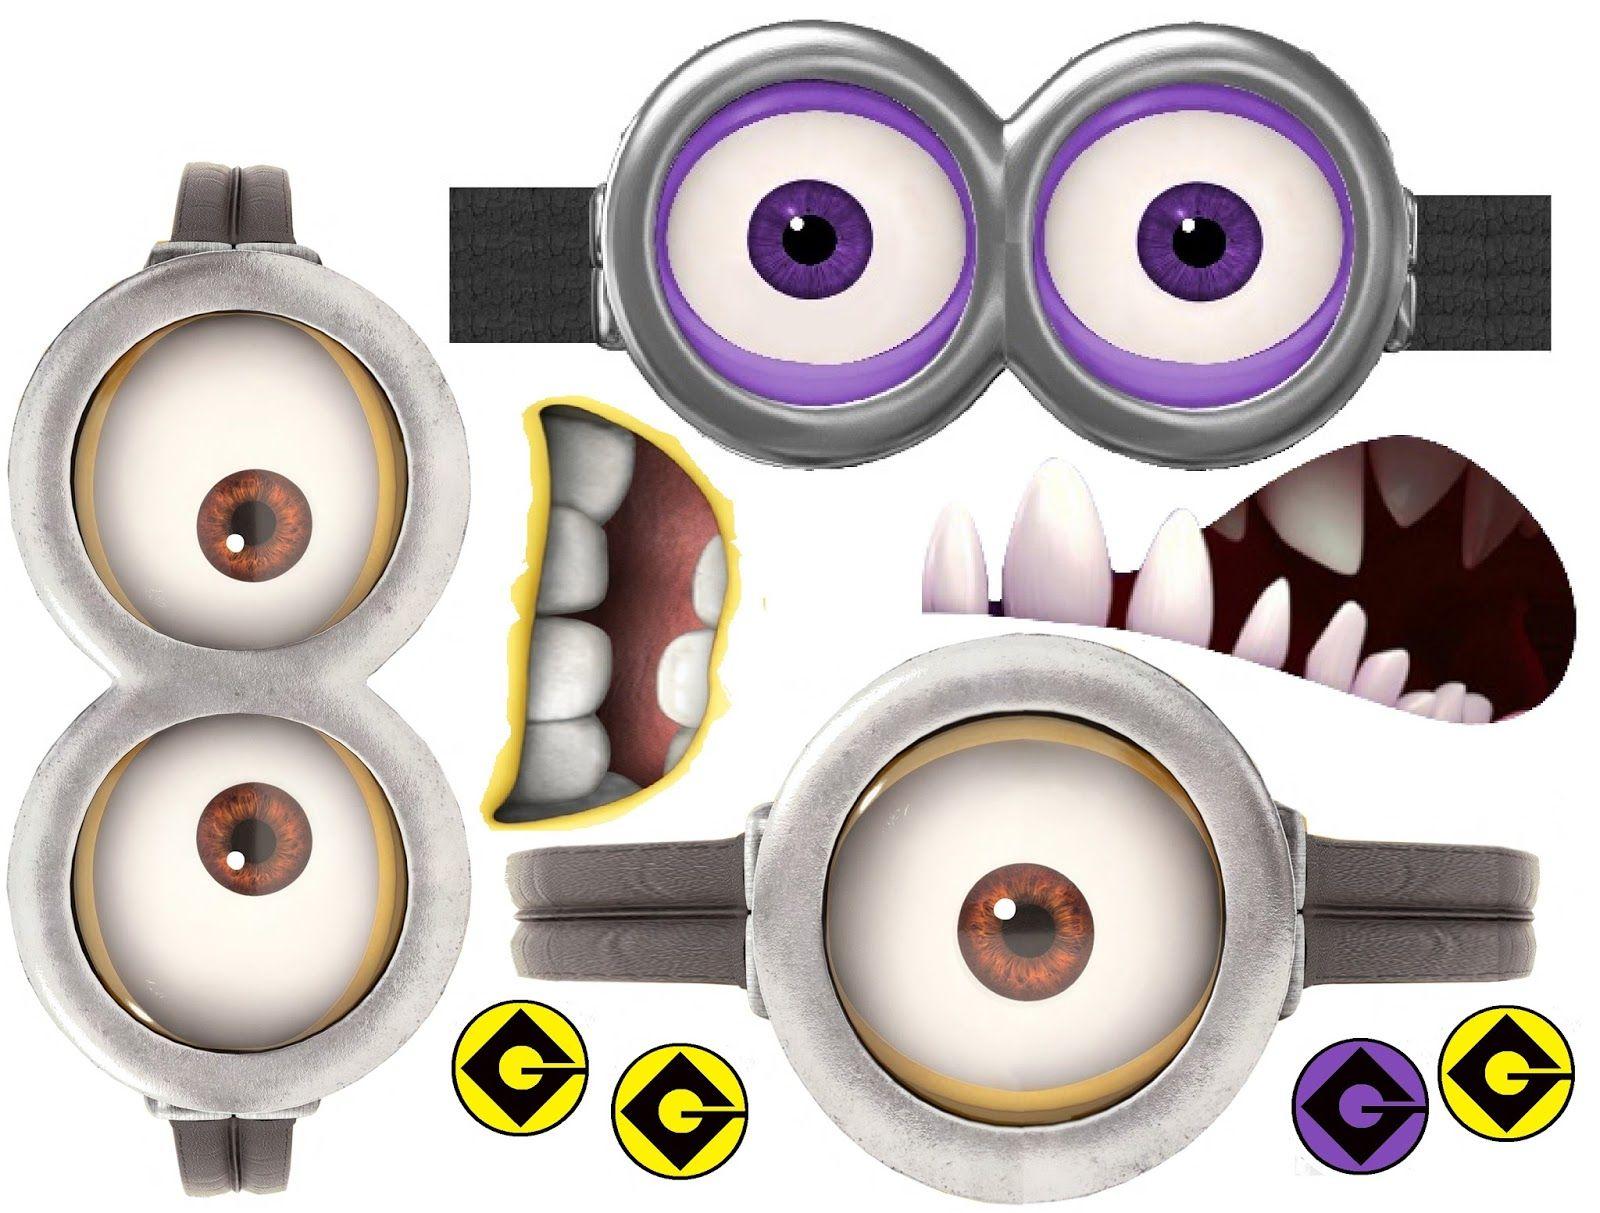 Image For Amazing Minion Eye Wallpaper HD